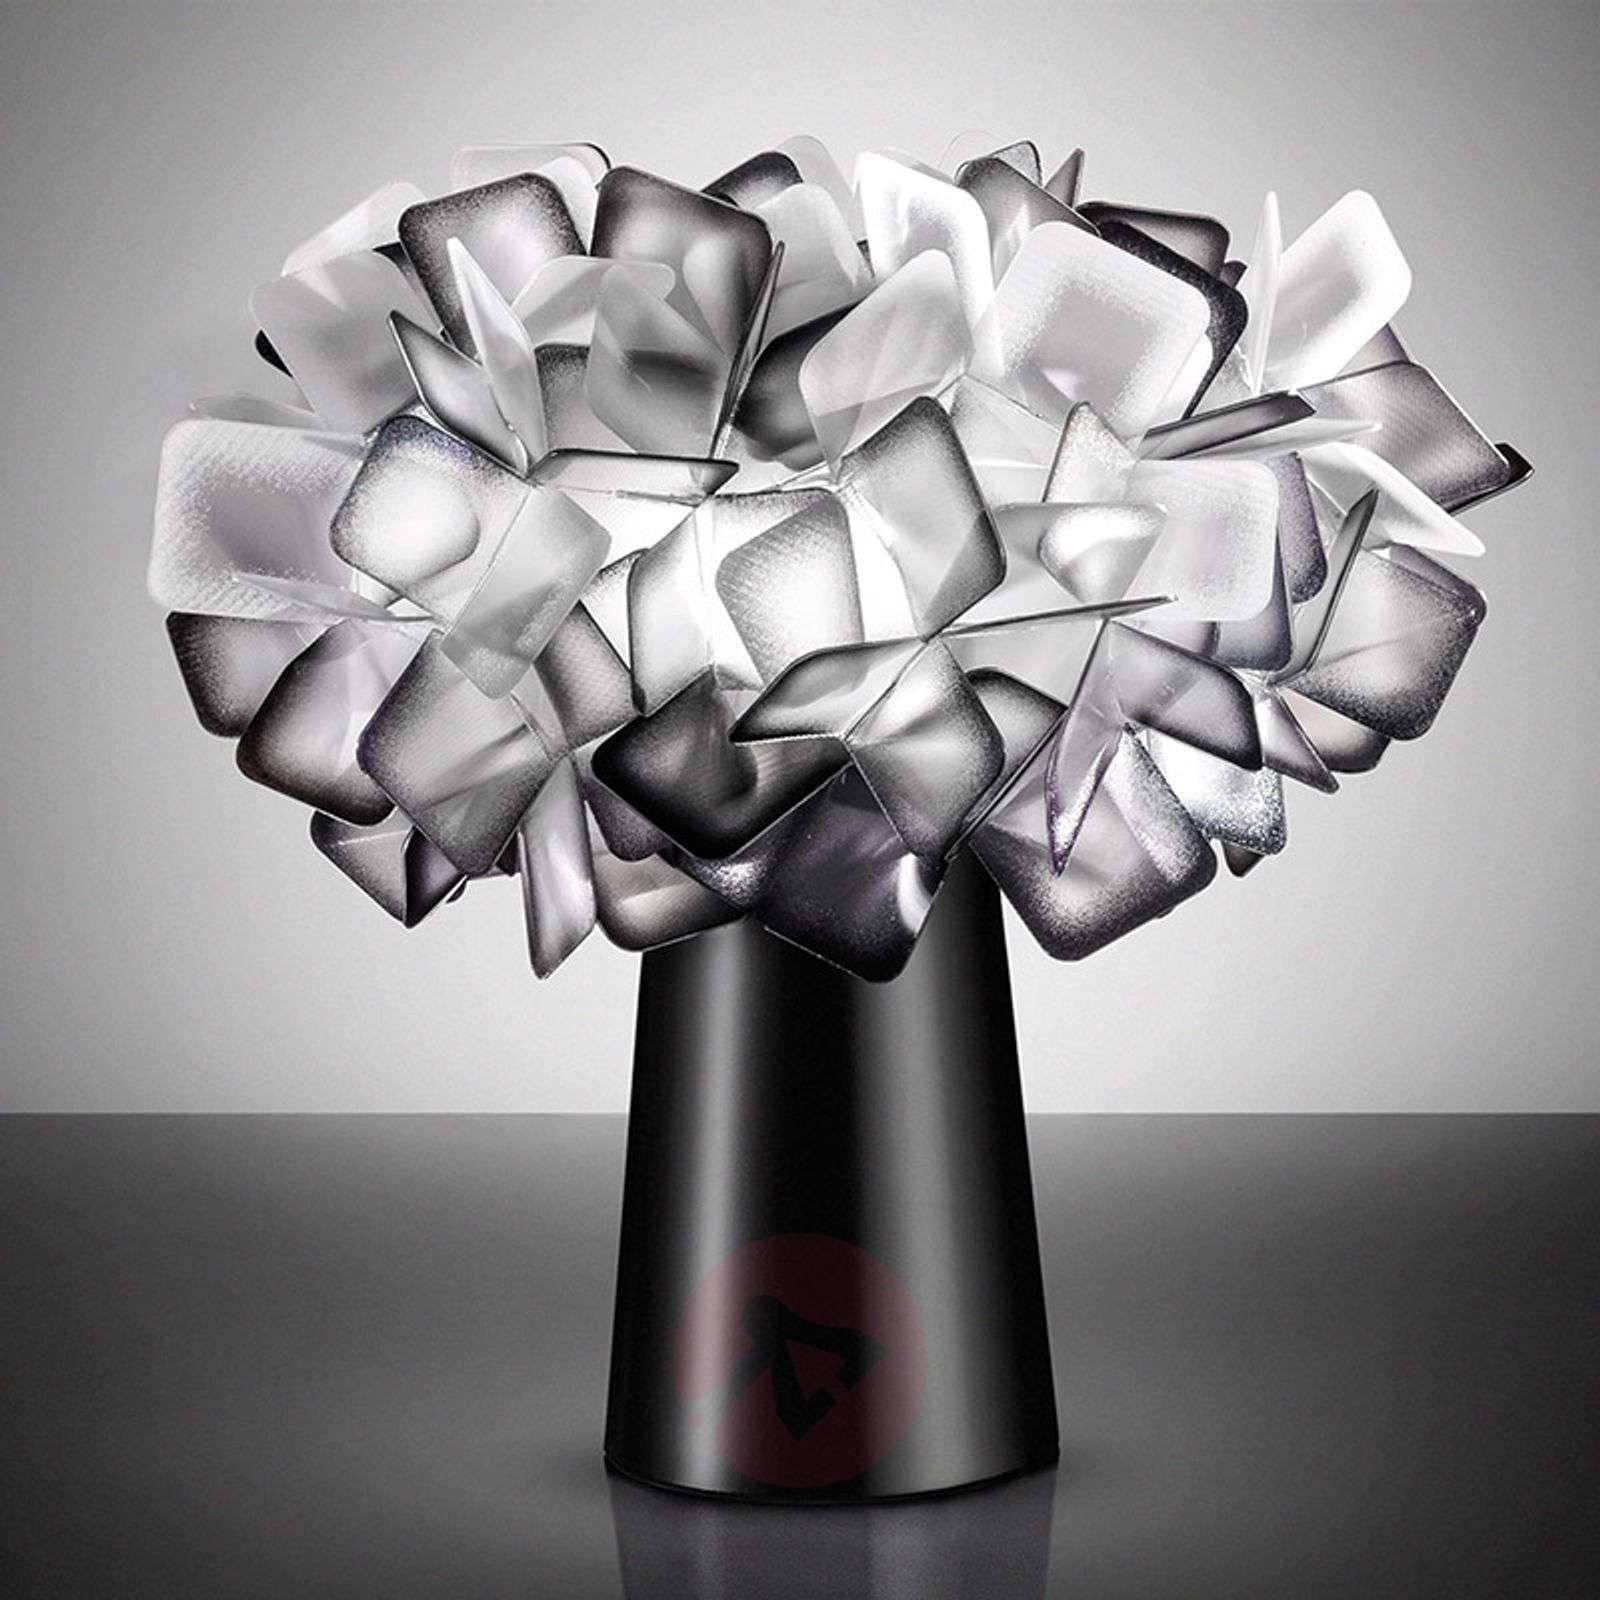 Musta design-pöytävalaisin Clizia-8503254-01